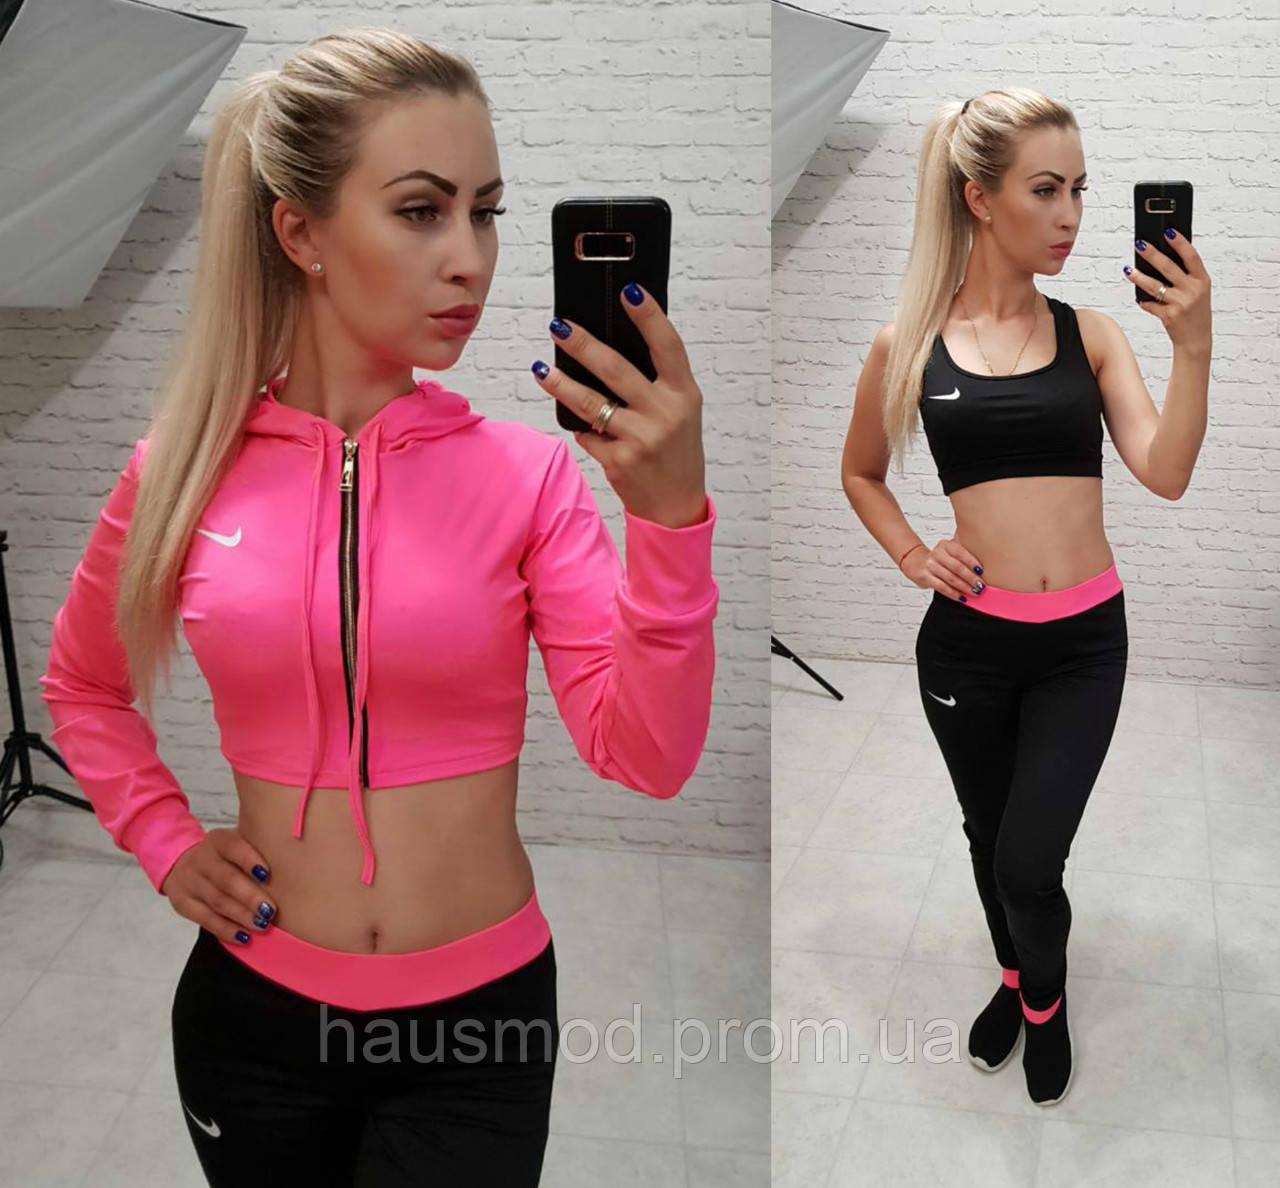 Фитнес костюм 3-ка реплика Nike мастерка мини топ и лосины микро дайвинг розовый